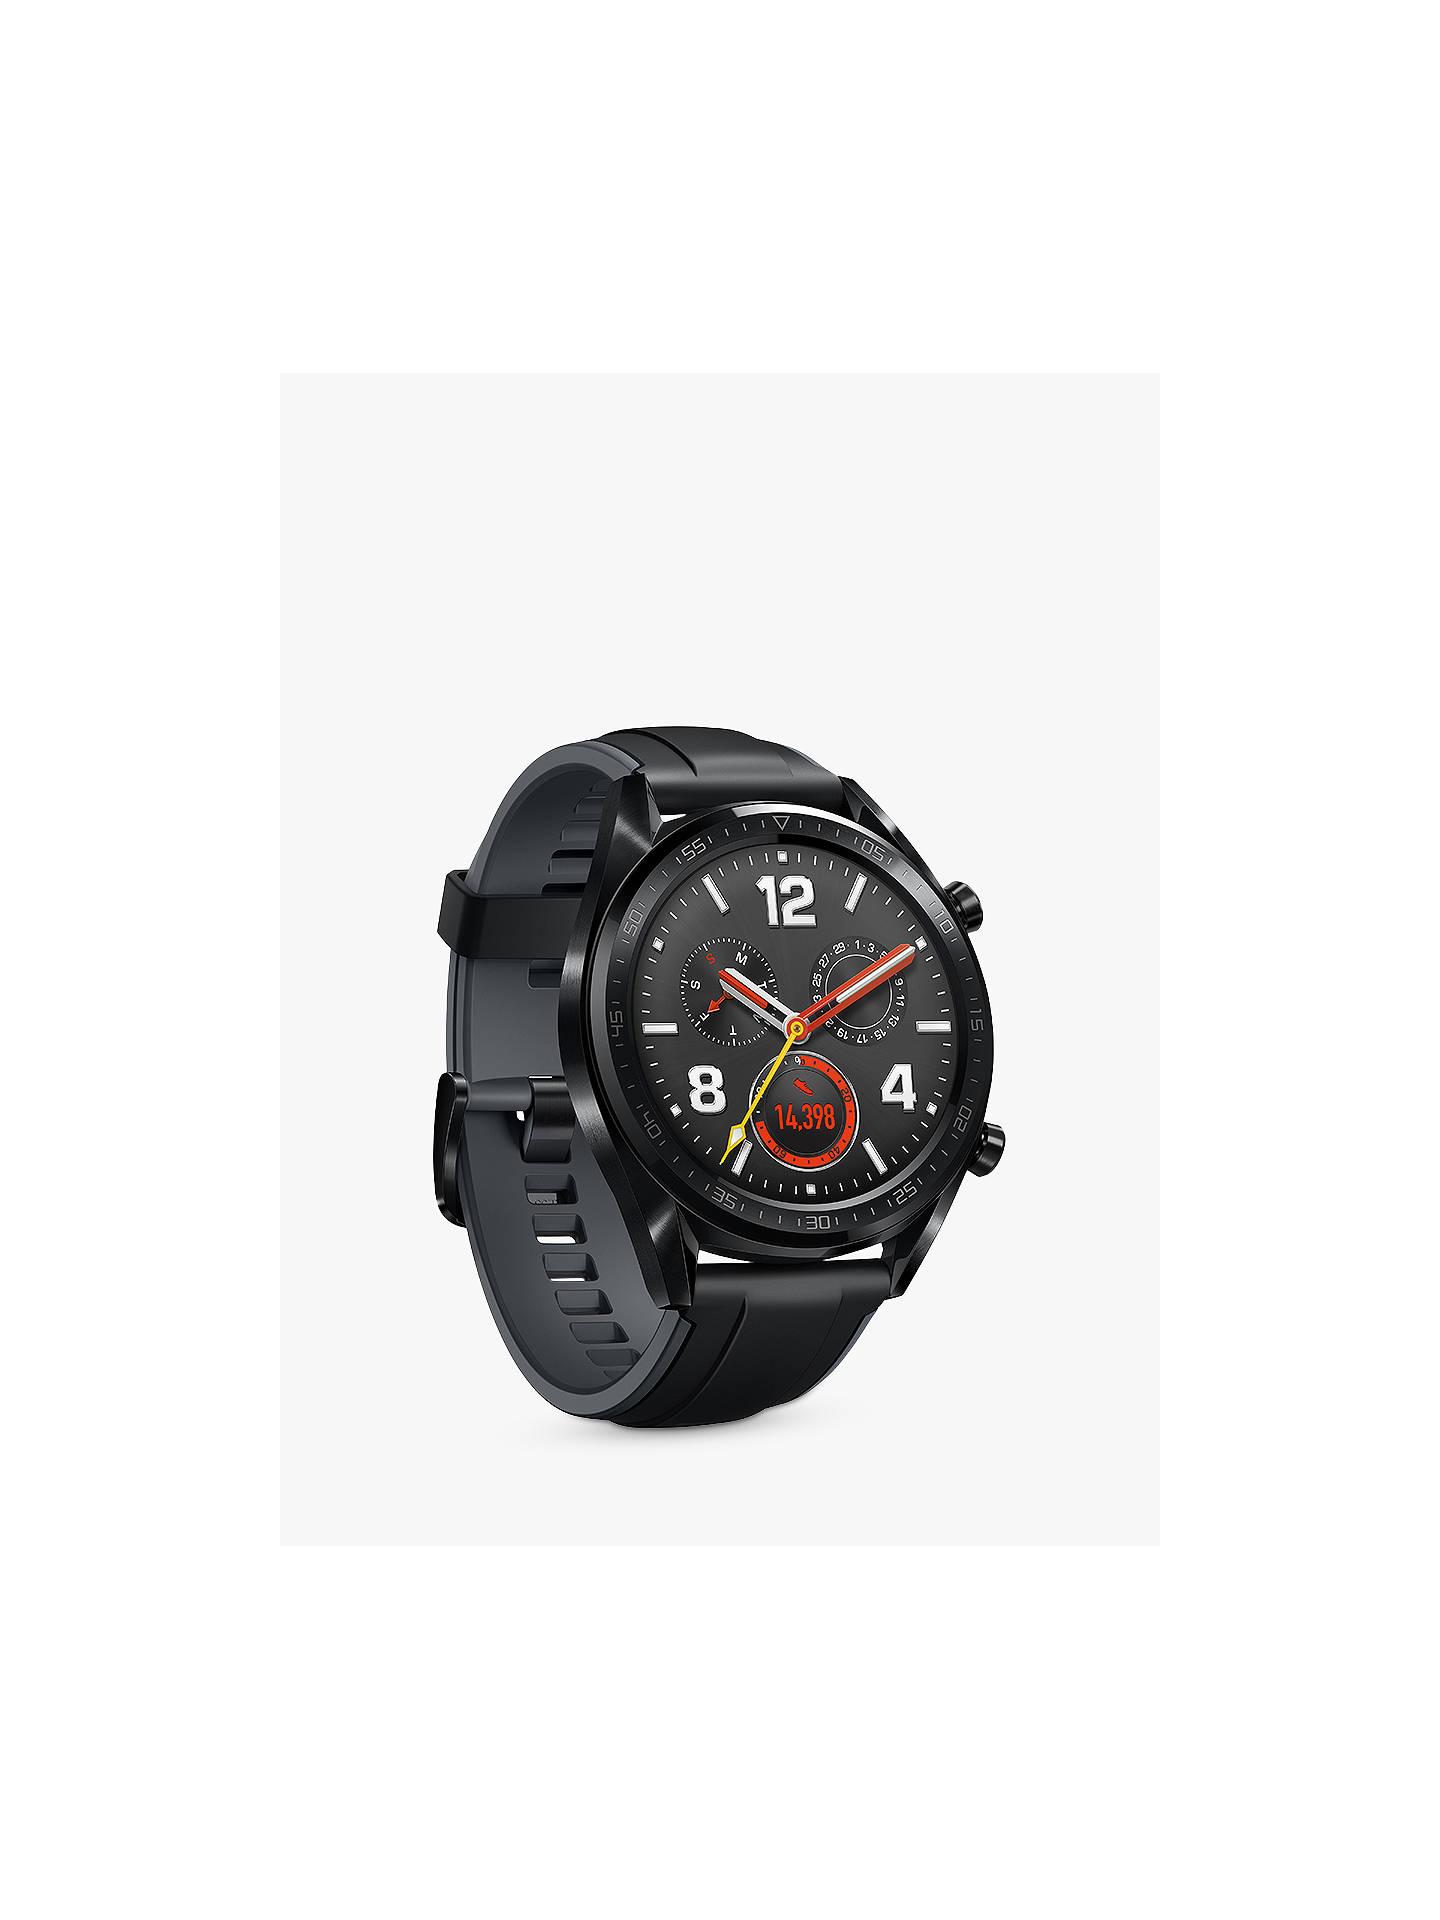 Huawei Watch GT Sport Smartwatch with GPS